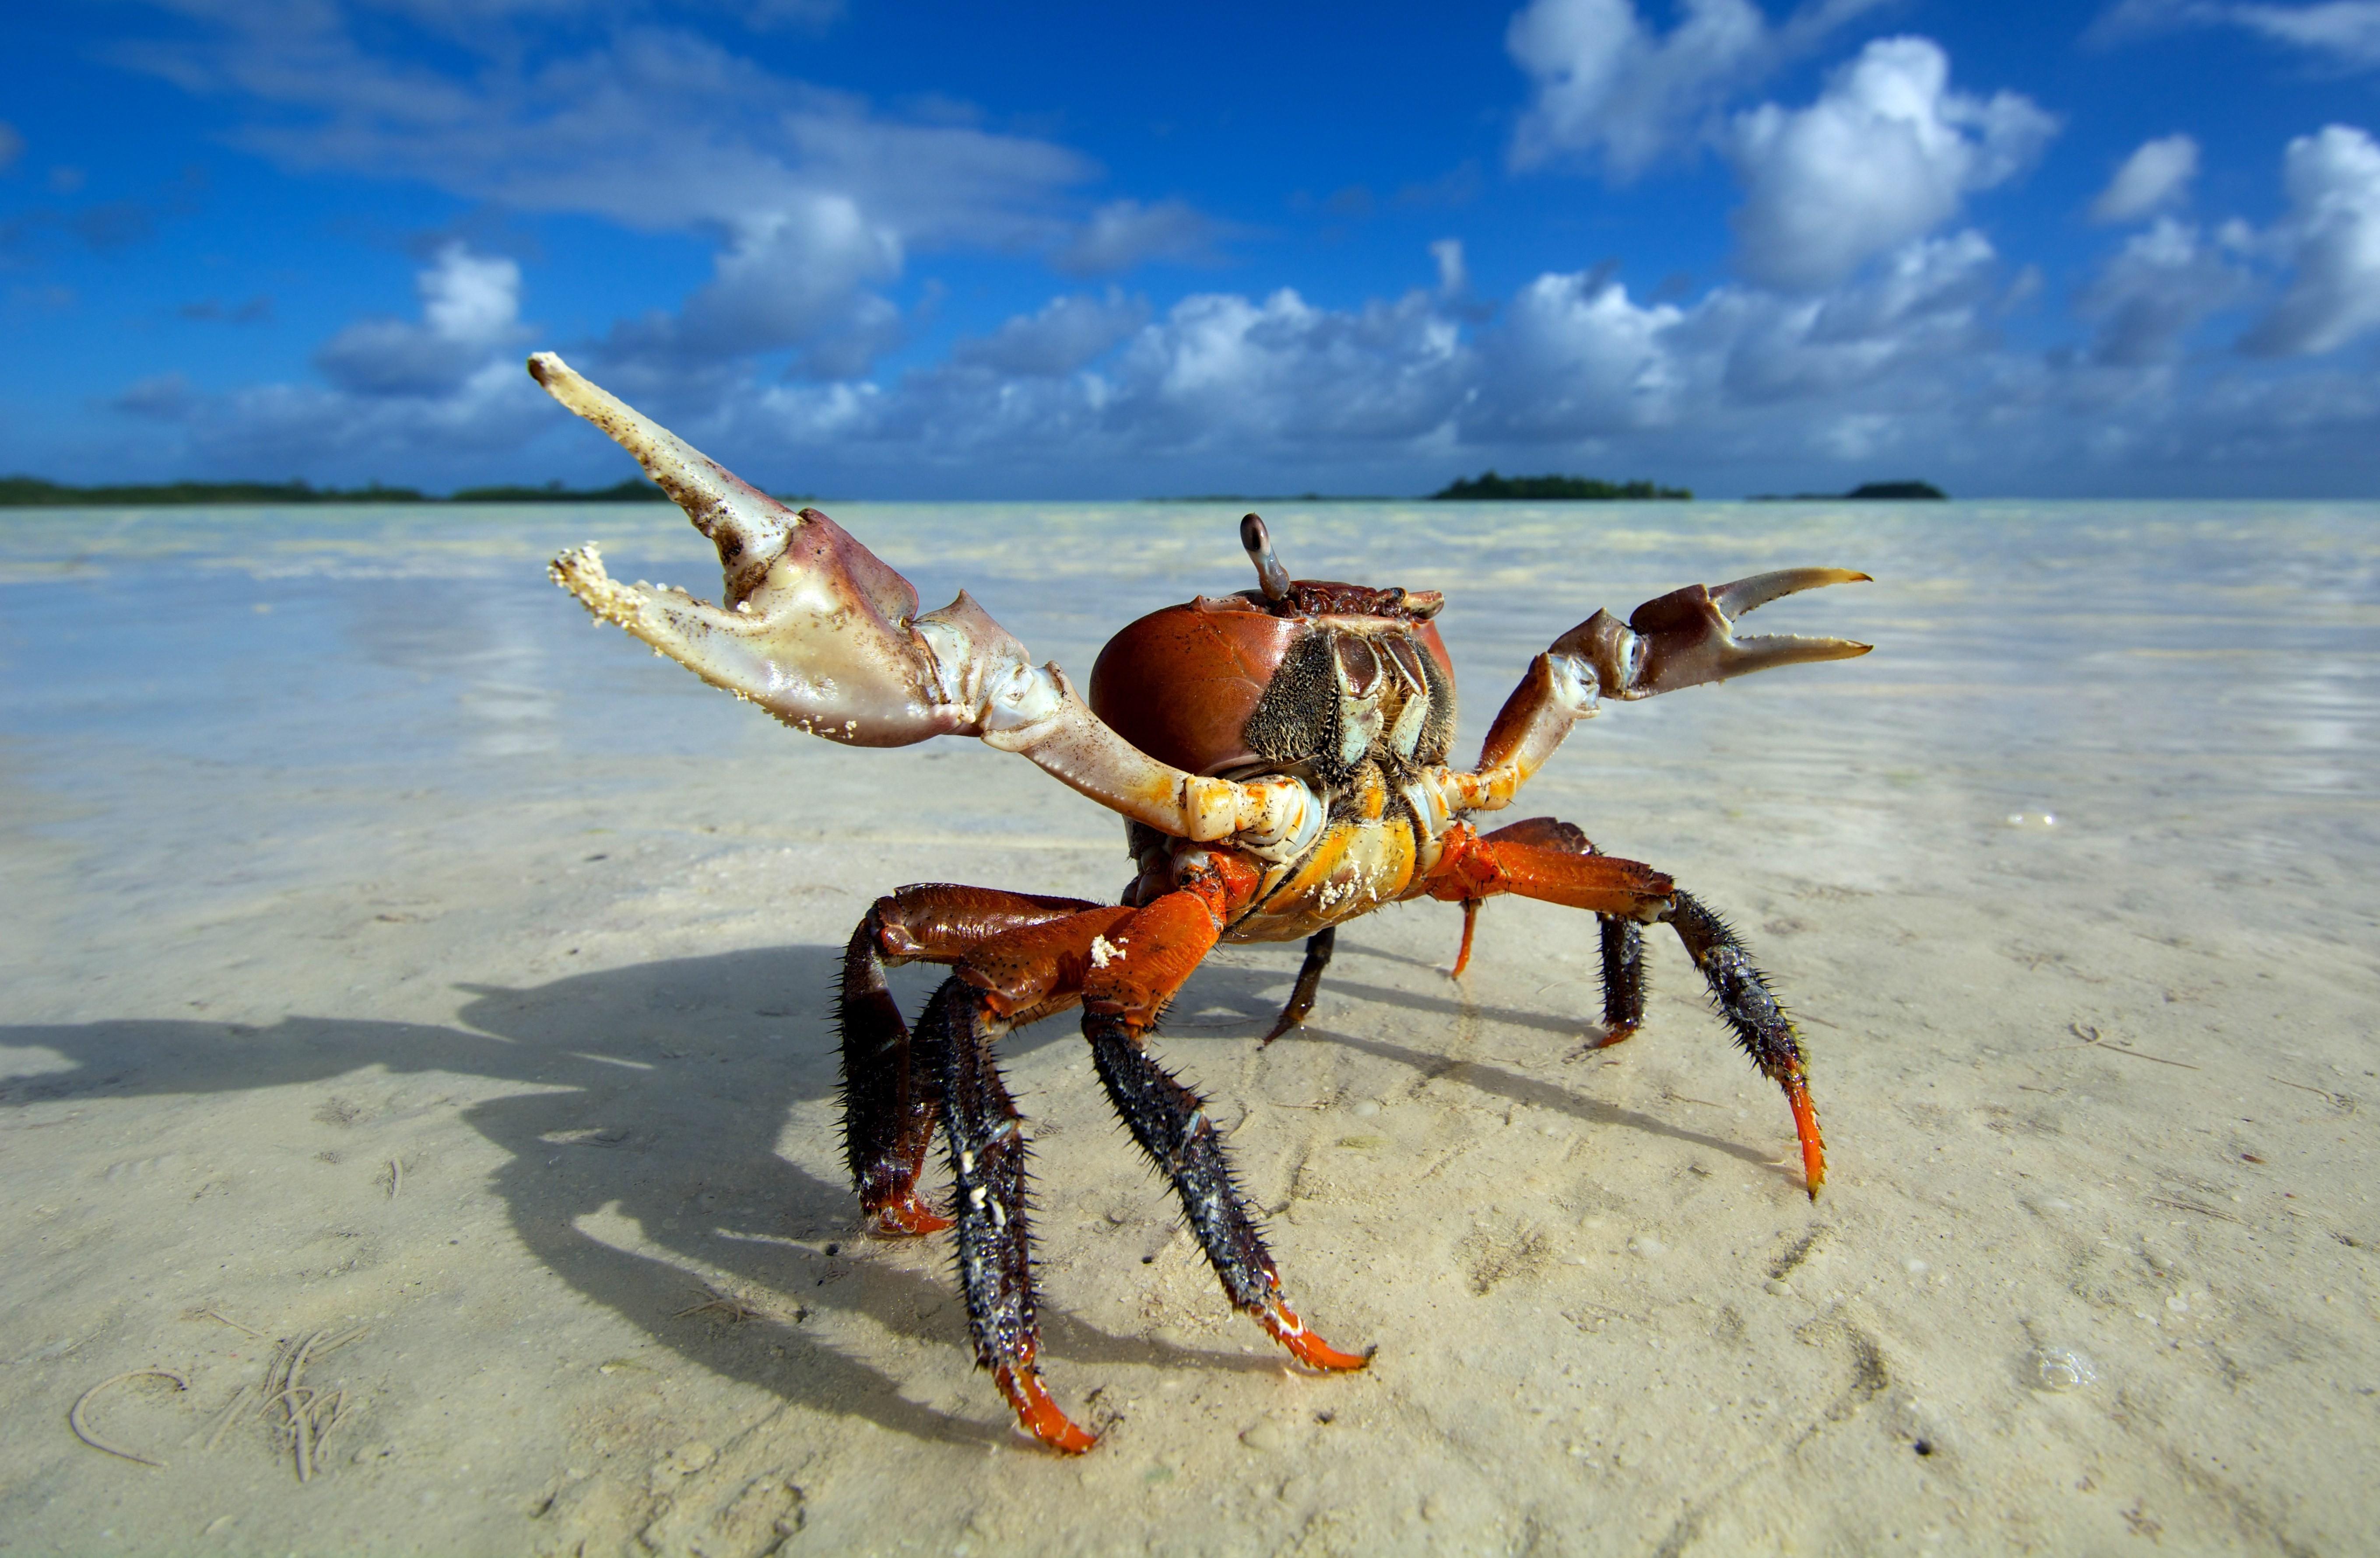 Crab Hd Animals 4k Wallpapers Images Backgrounds HD Wallpapers Download Free Images Wallpaper [1000image.com]